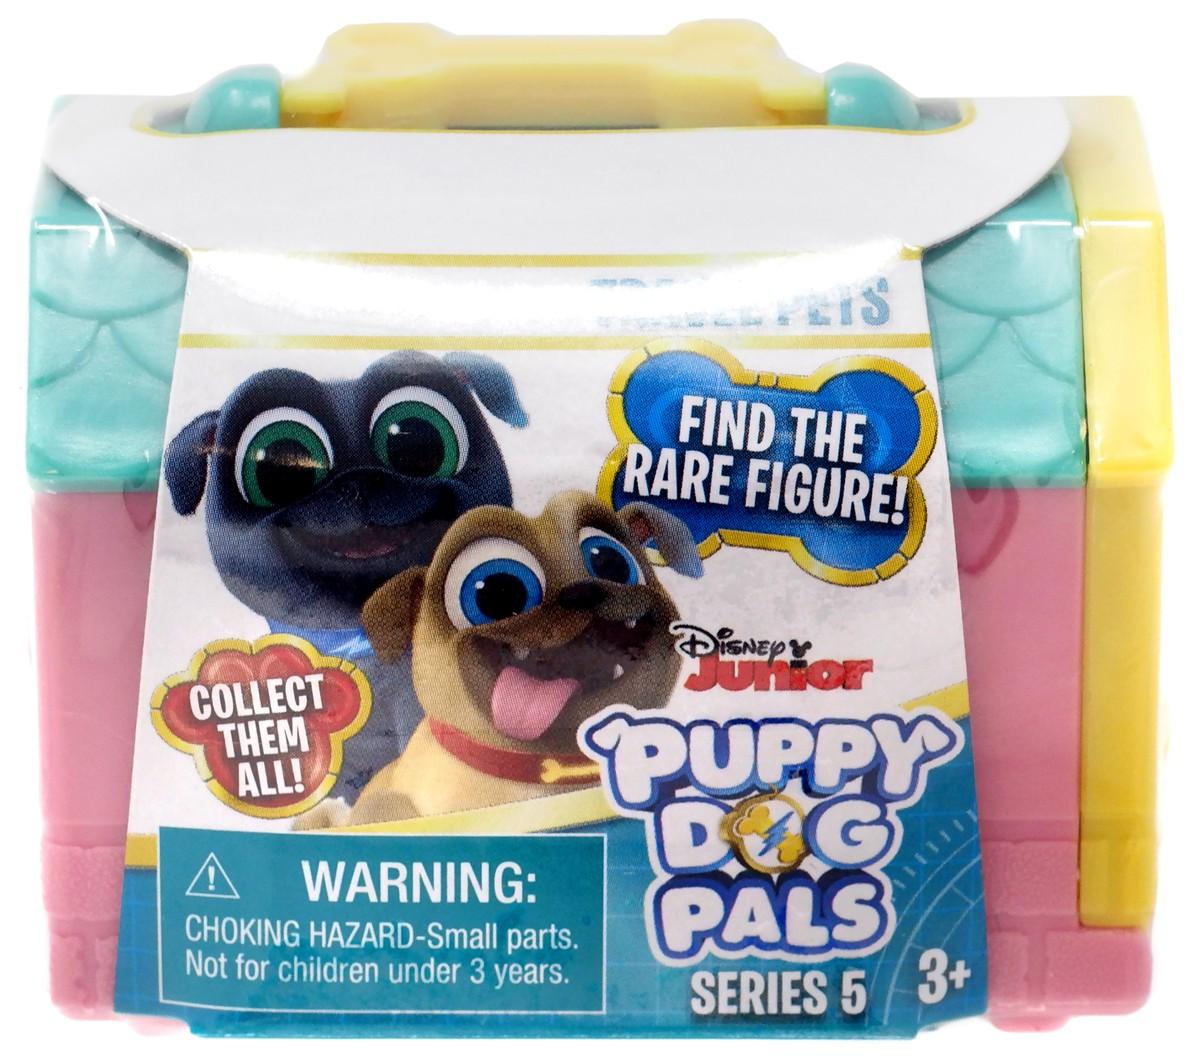 PUPPY DOG PALS Travel Pets DISNEY JUNIOR figurine mystery CUPCAKE